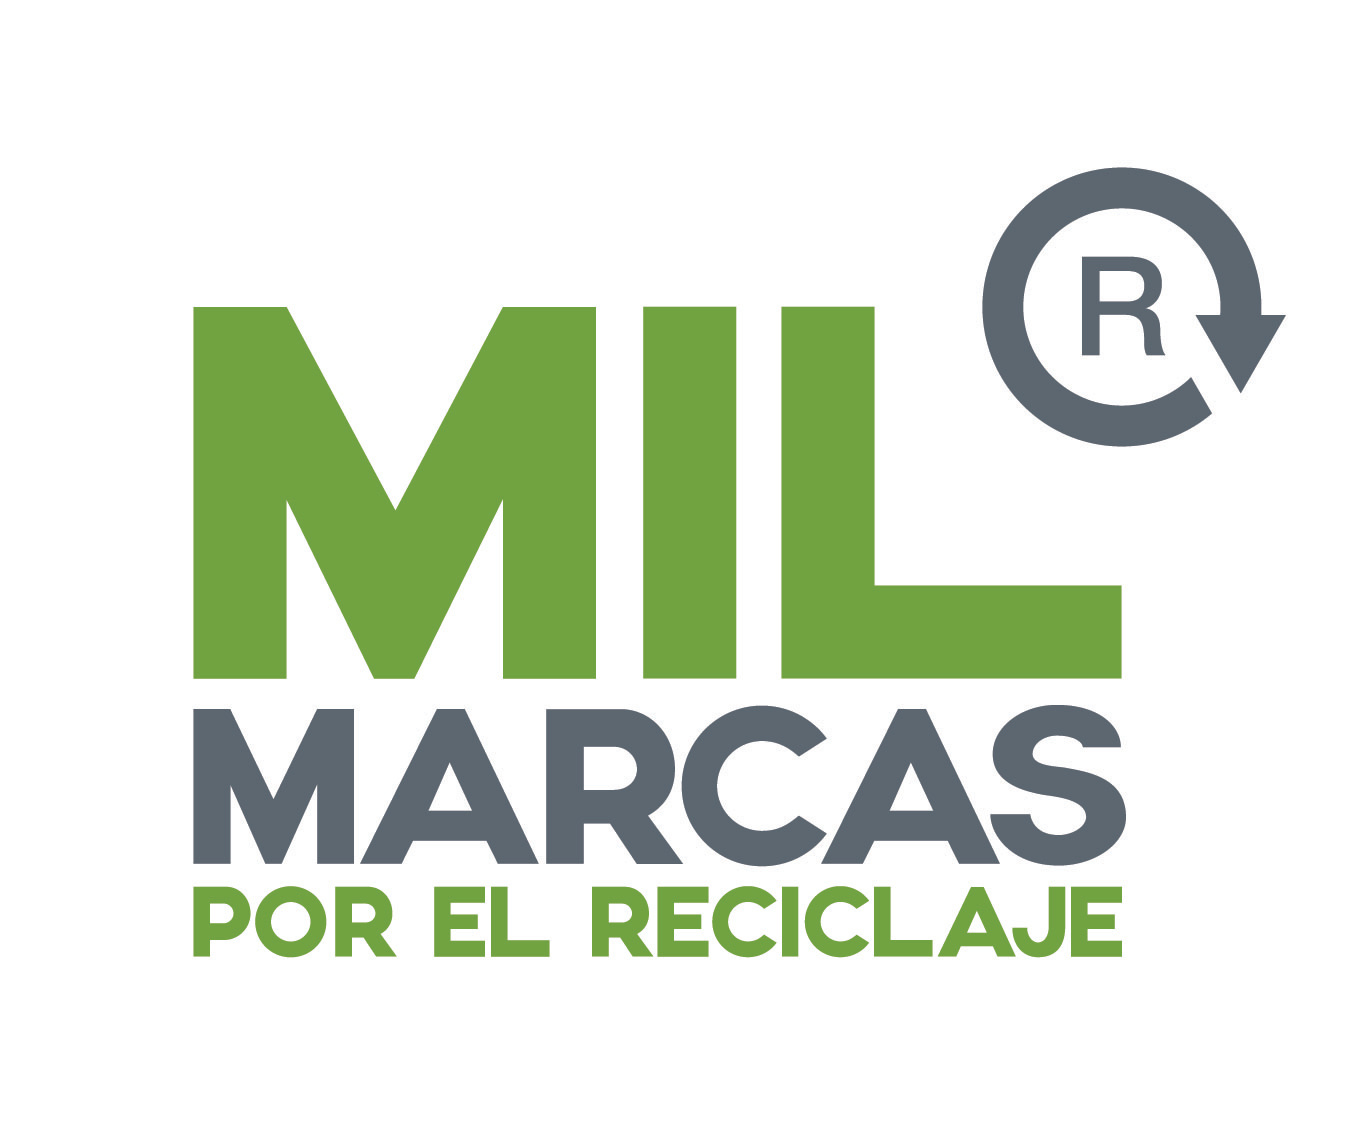 MMxR_logo2